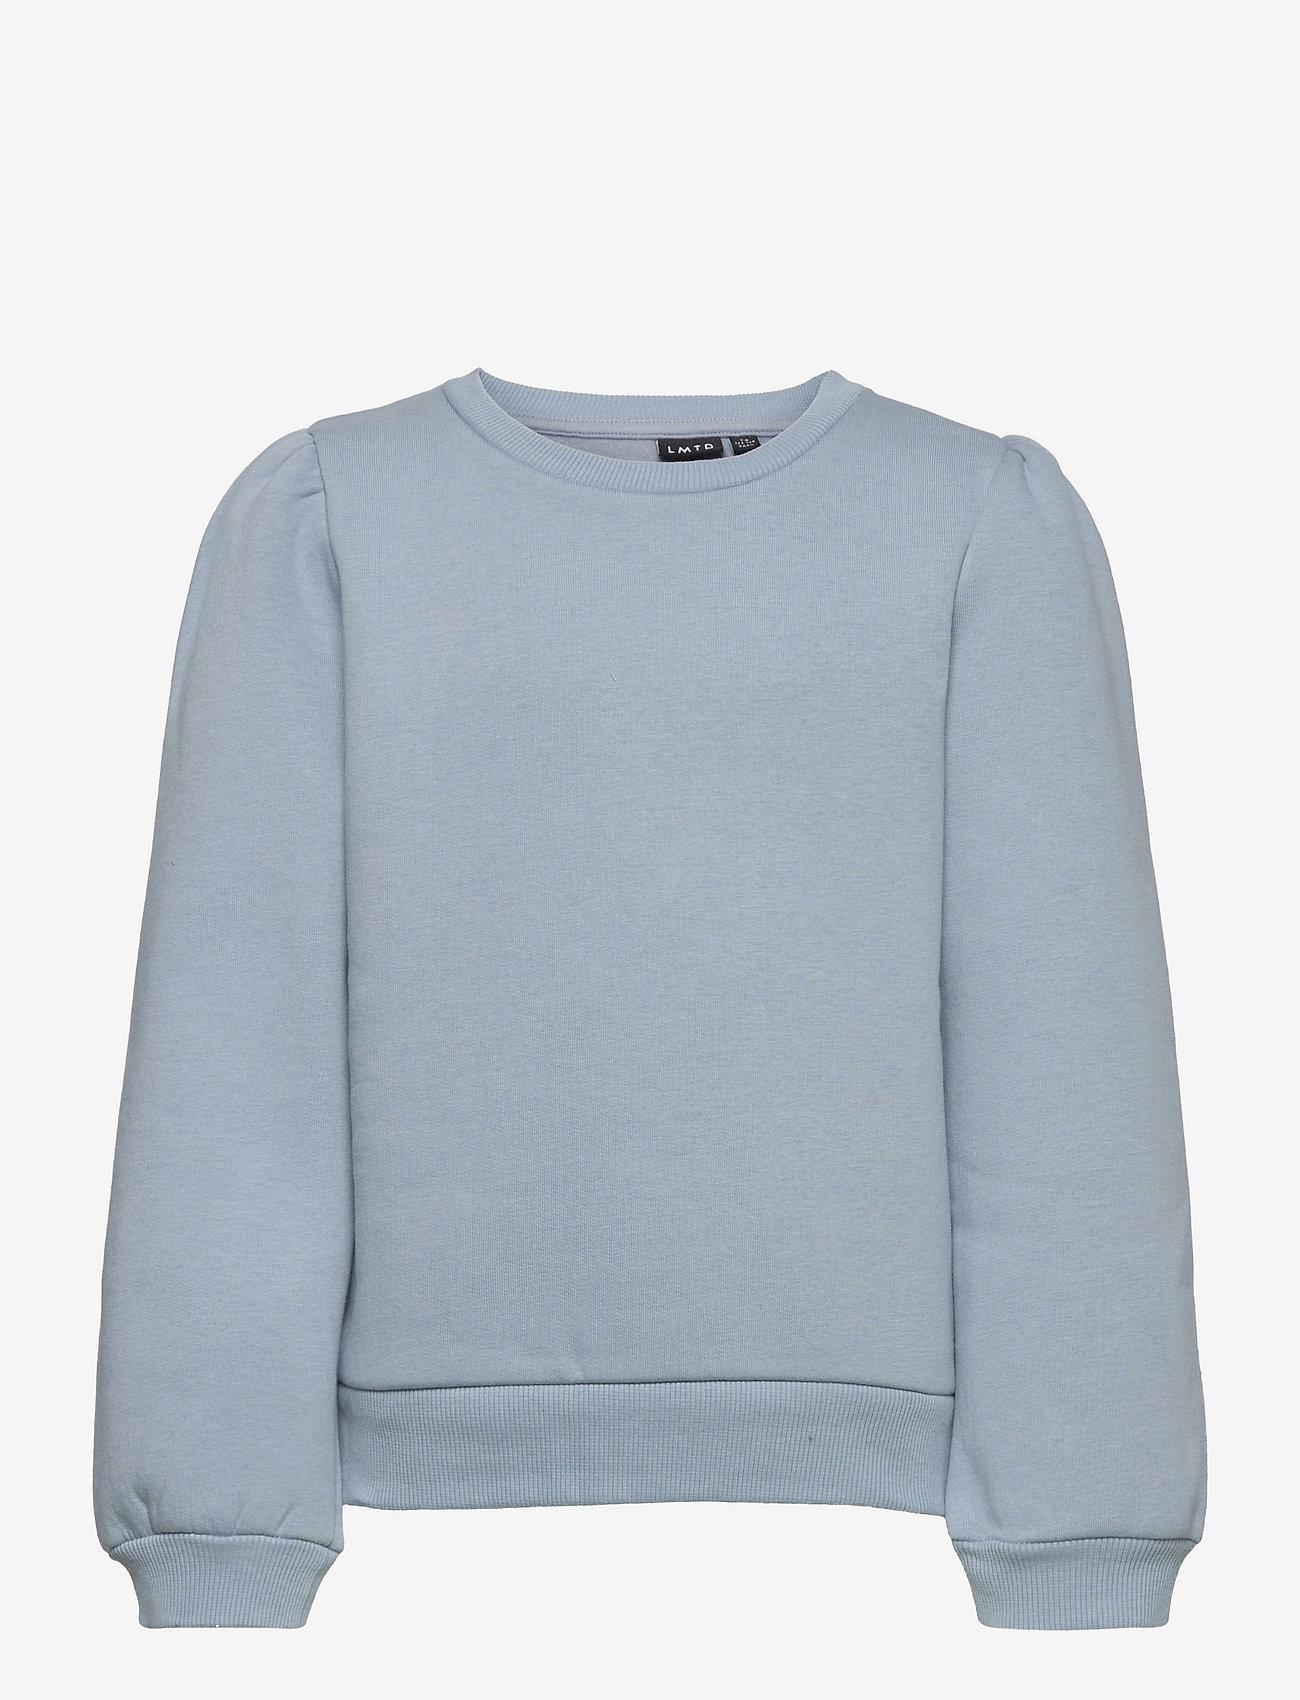 LMTD - NLFOPAL LS SHORT PUFF SWEAT - sweatshirts - dusty blue - 0